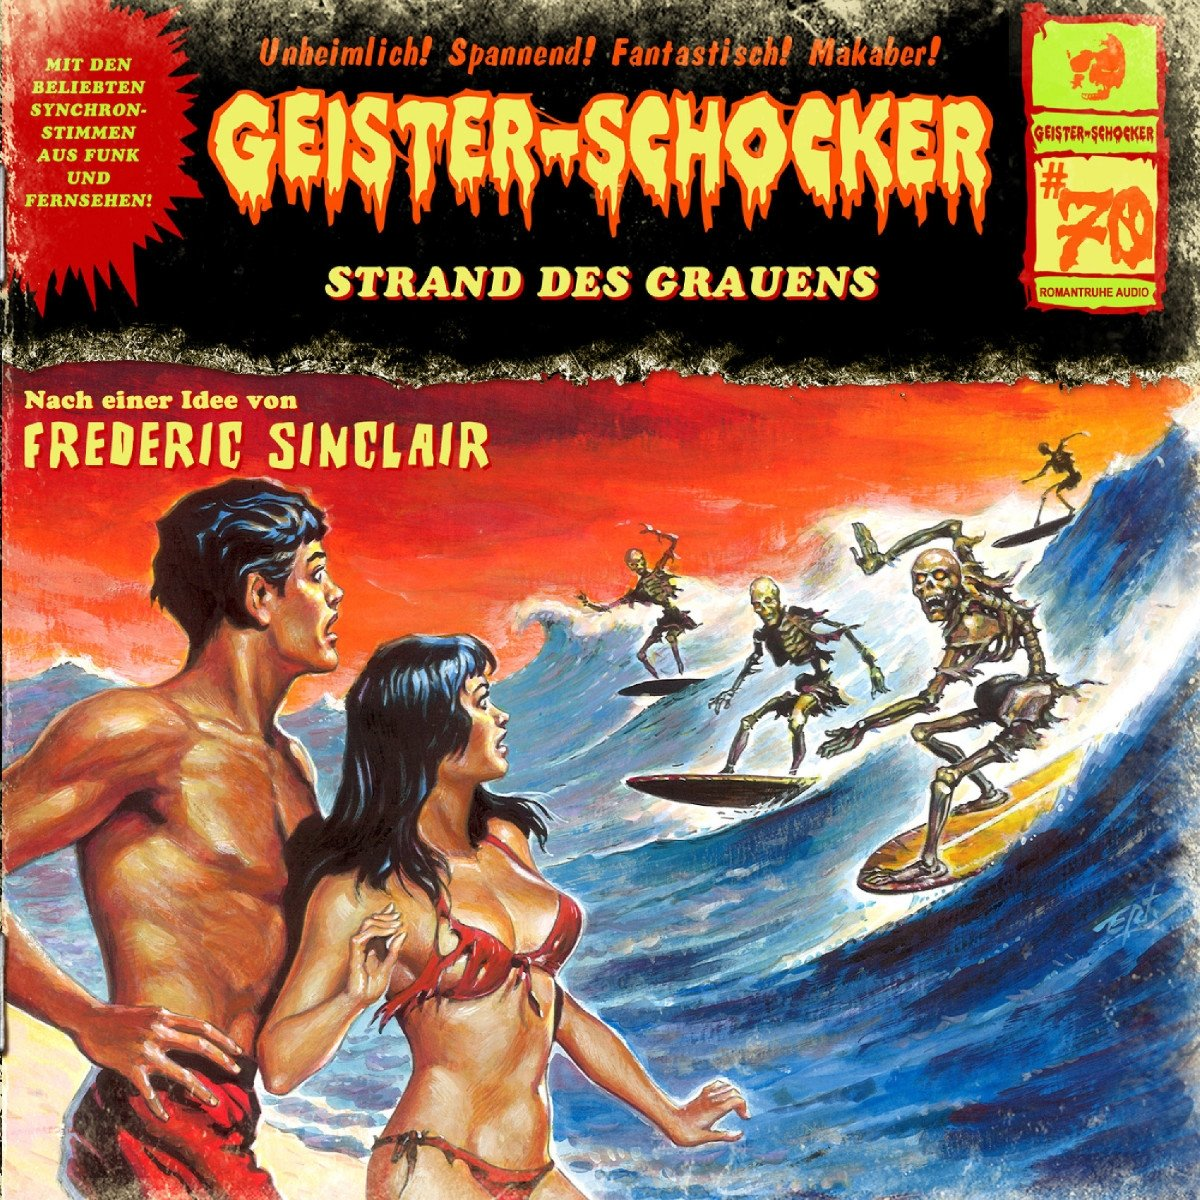 Geister-Schocker (70) Strand des Grauens - Romantruhe 2017